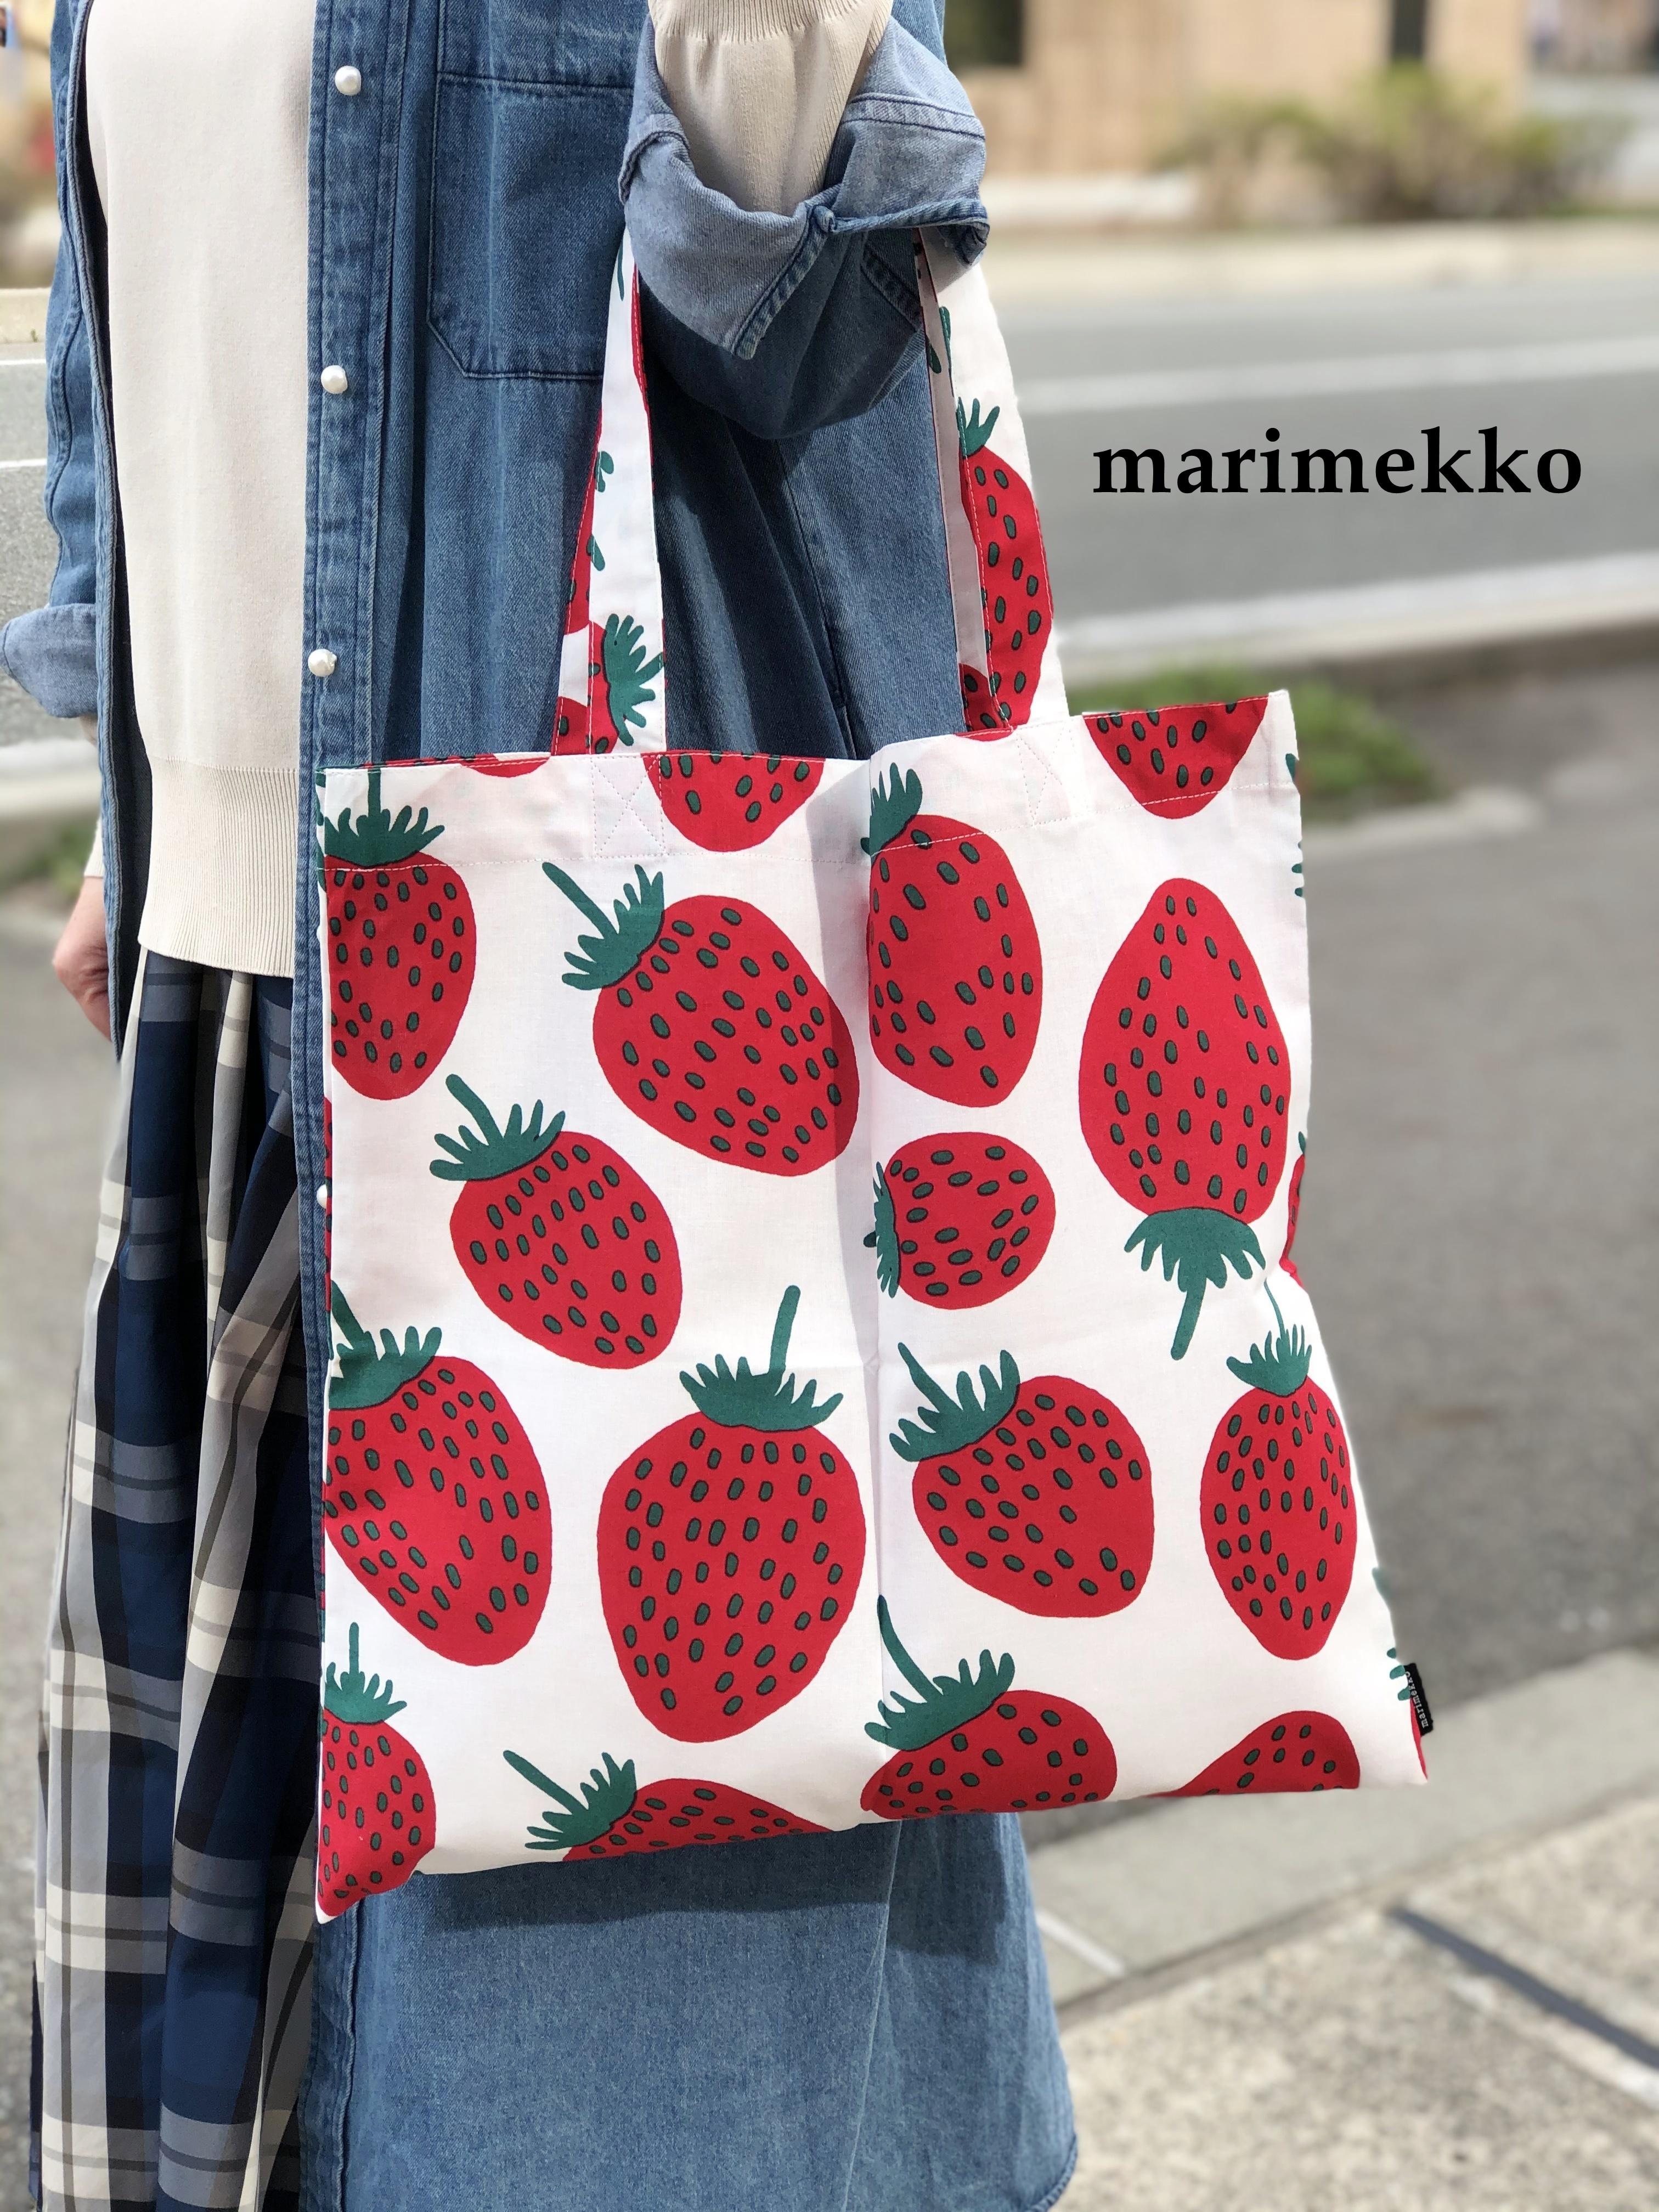 marimekko (マリメッコ)/ ファブリックバッグ/mansikka(マンシッカ苺)/70122